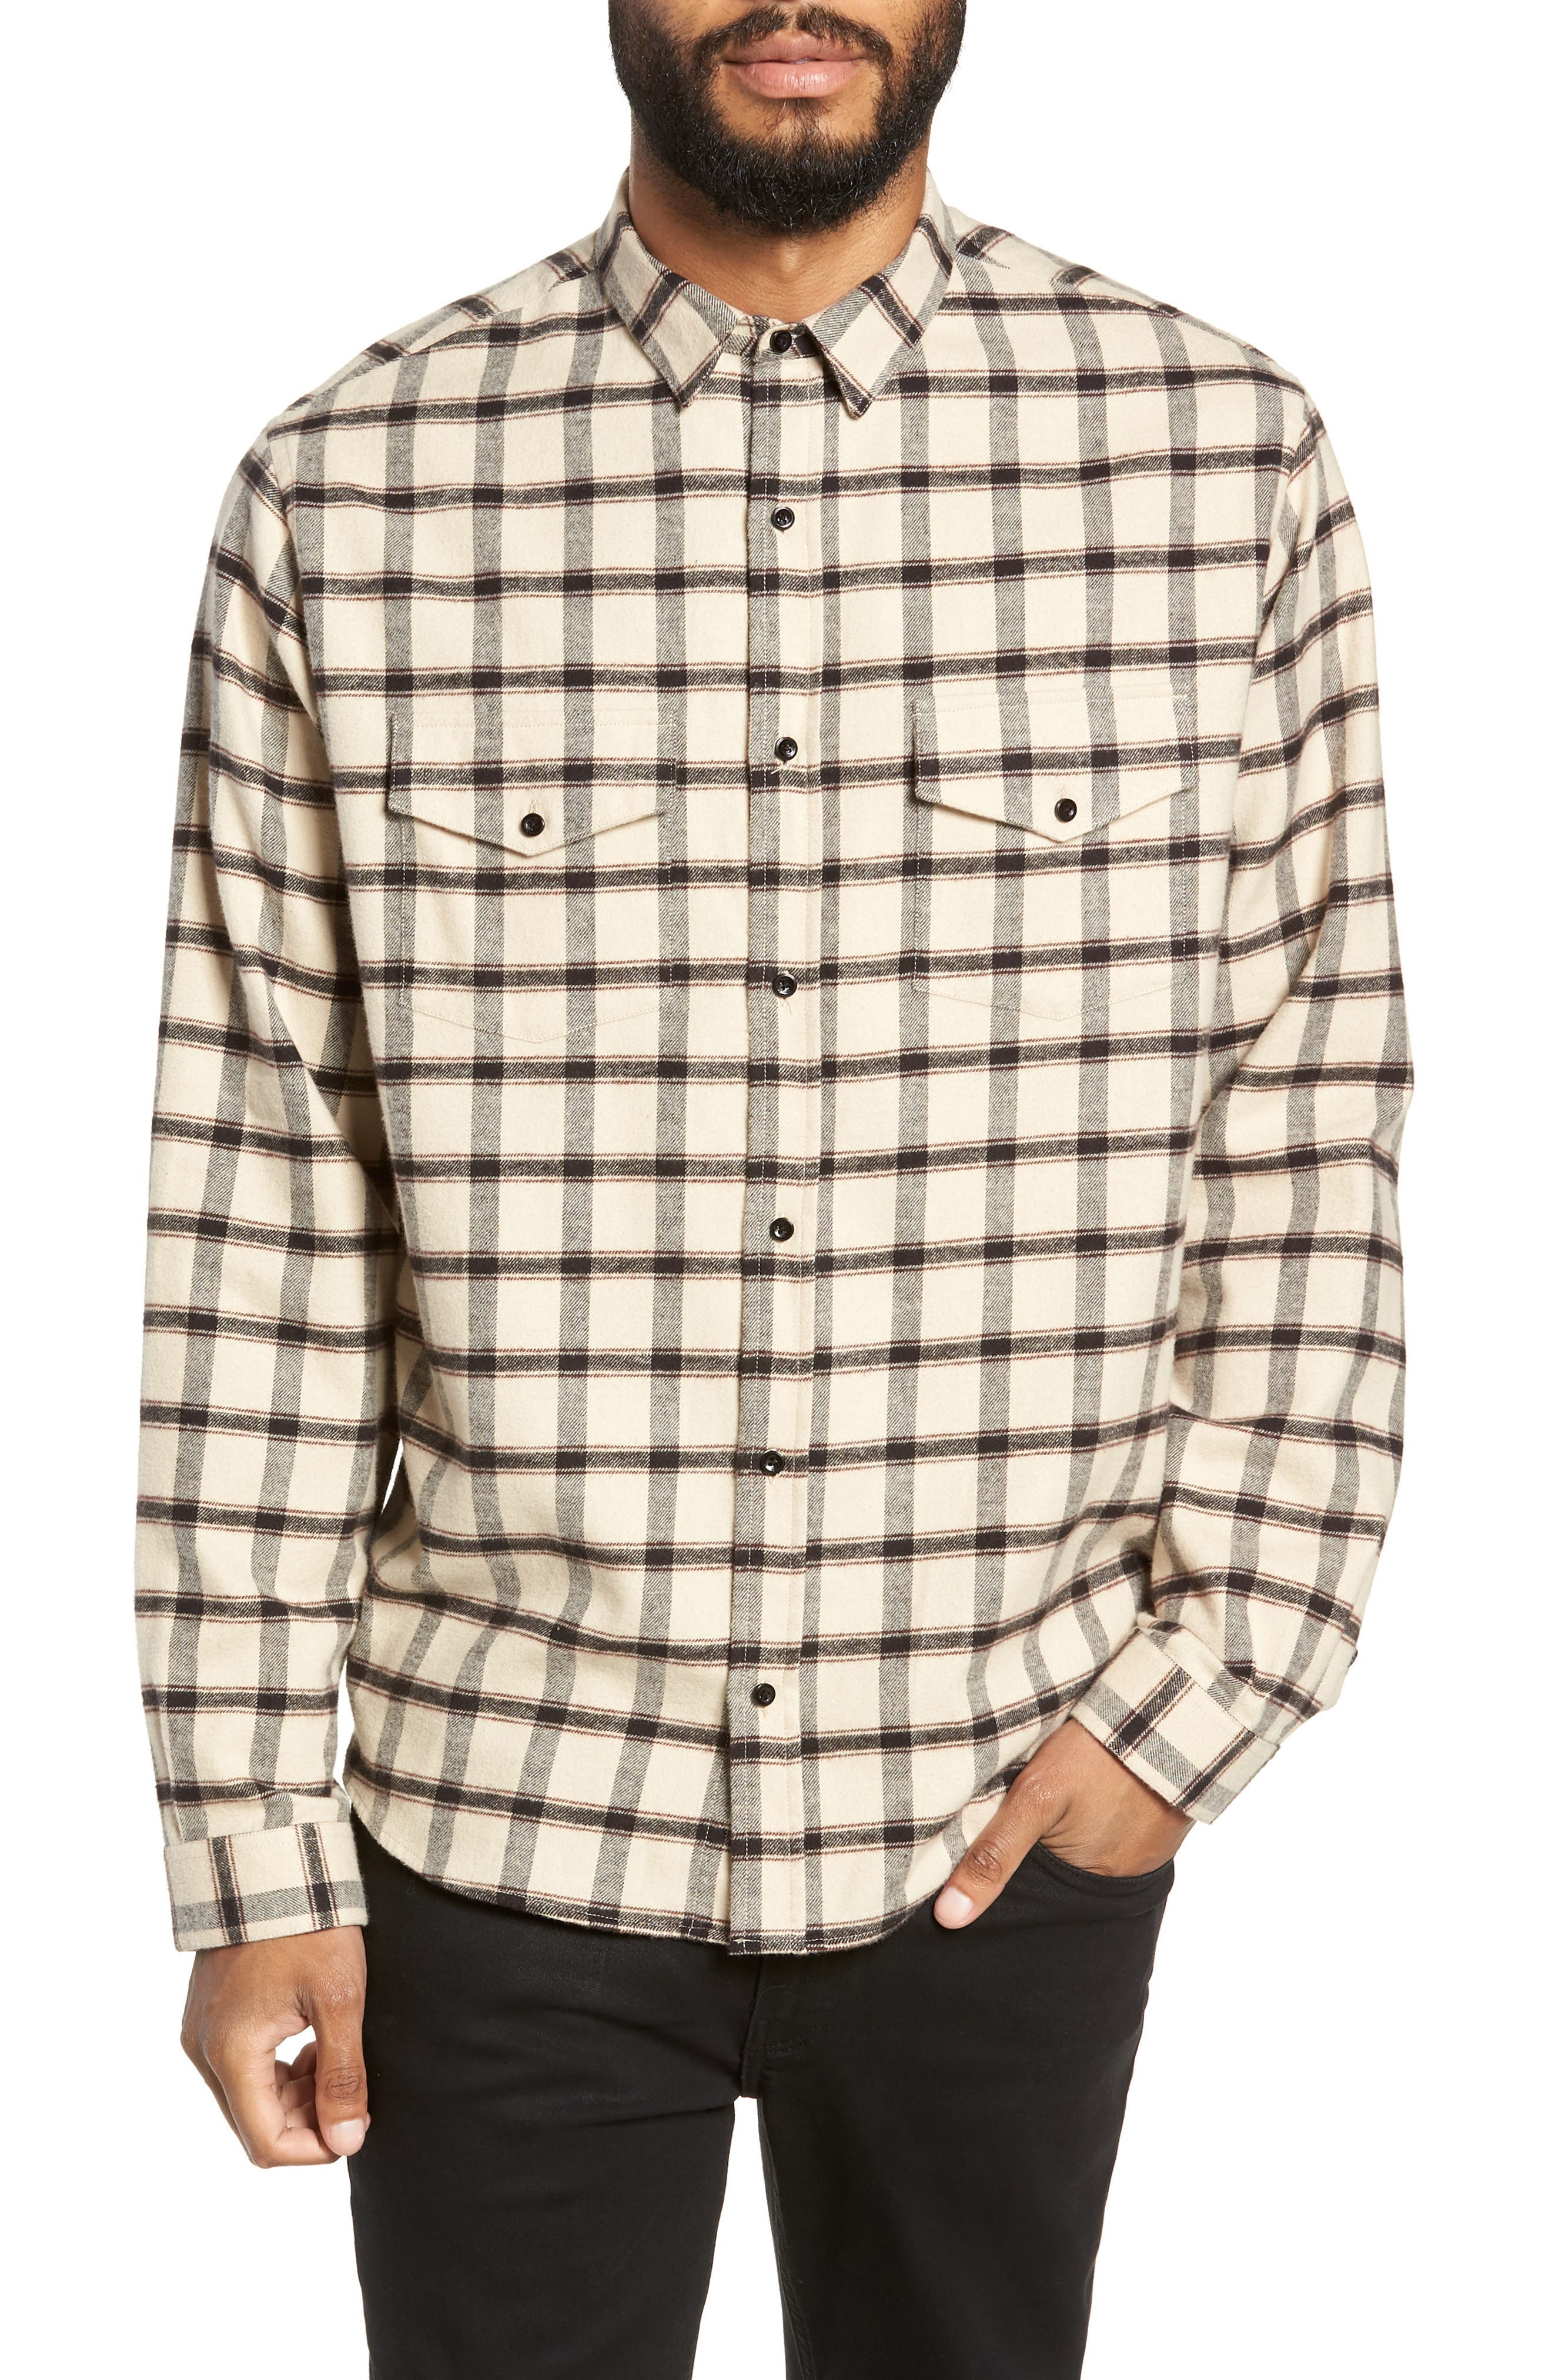 Long Sleeve Plaid Regular Fit Sport Shirt, Main, color, BEIGE/ BLACK